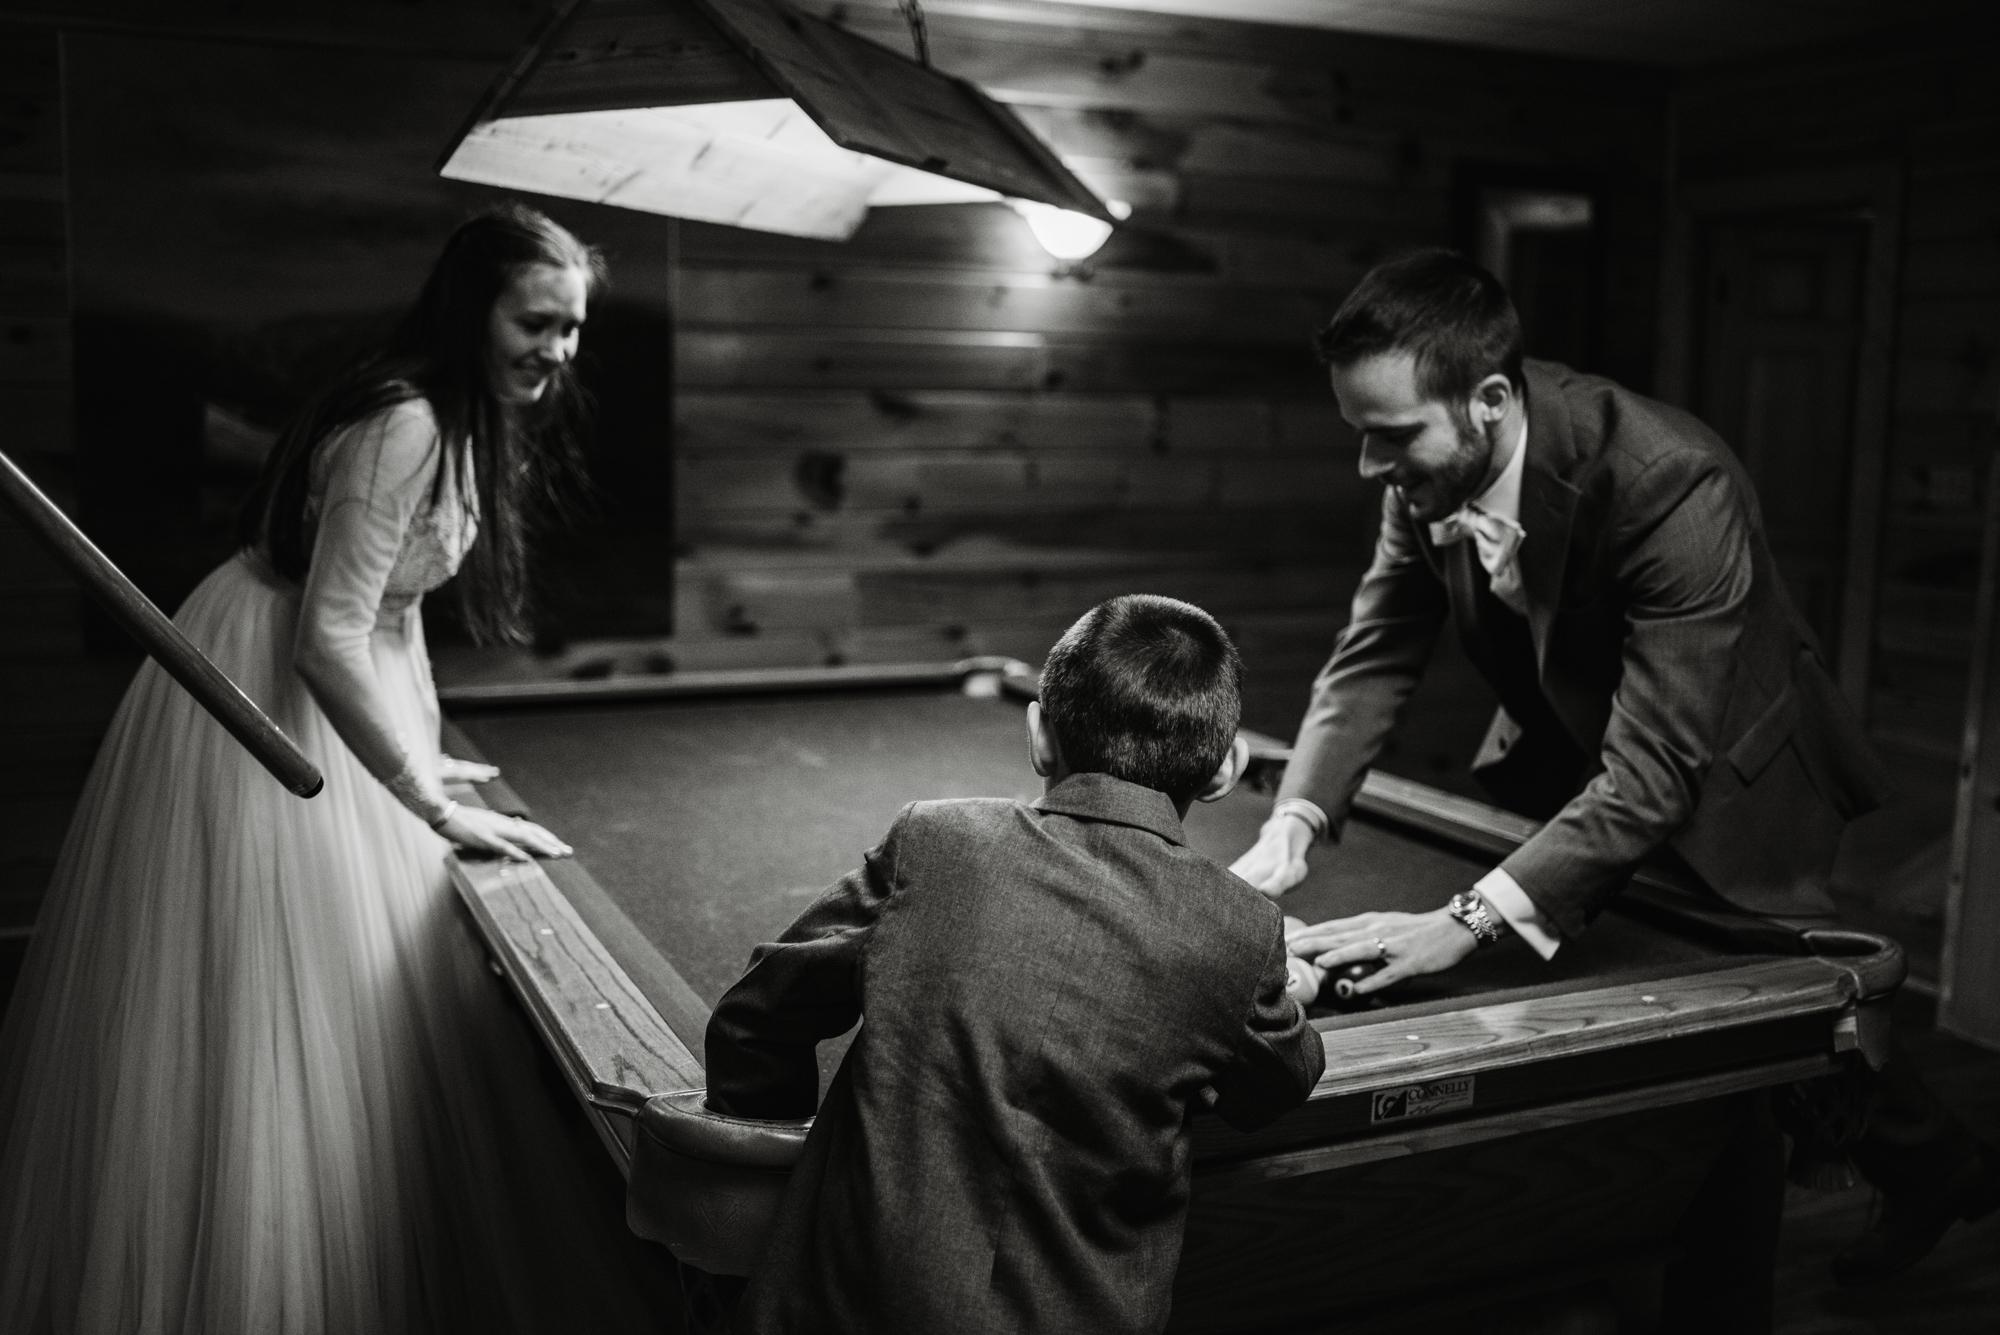 Paula and Andrew - Small Adventurous Wedding in Shenandoah National Park - Blue Ridge Mountain Wedding - White Sails Creative - Mountain Elopement_8.jpg